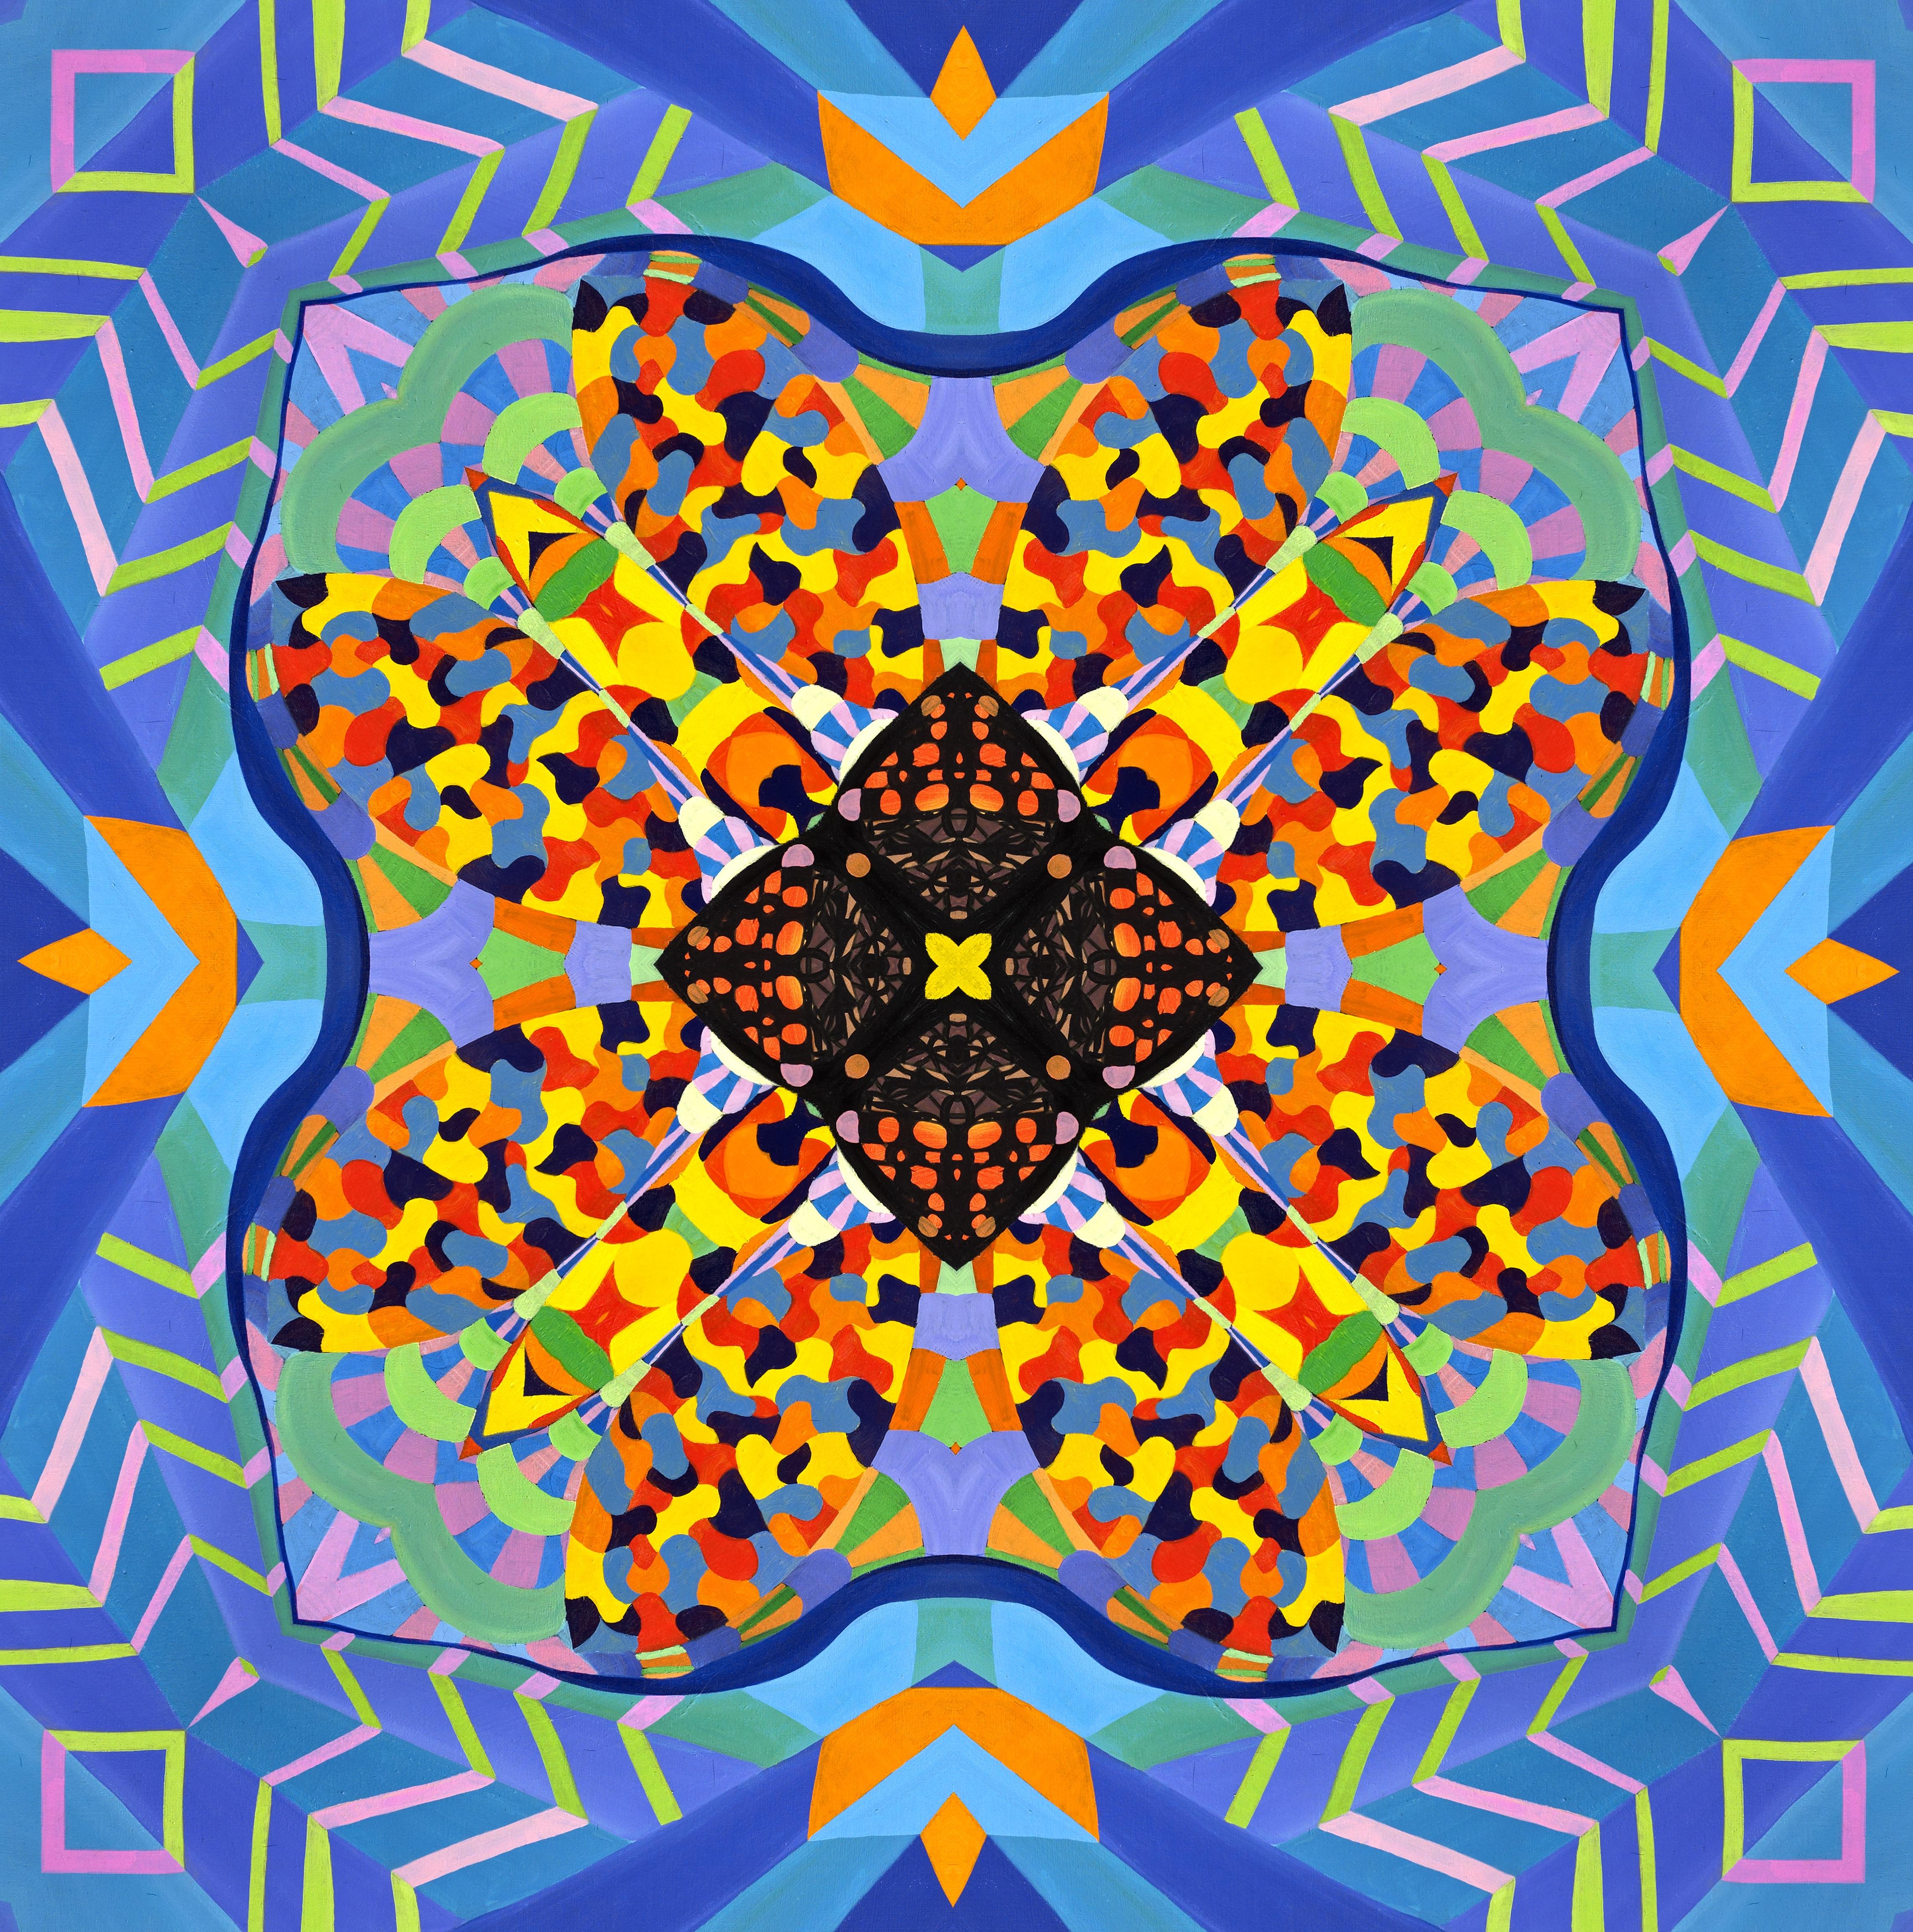 jordan-rakei-tom-misch-remix